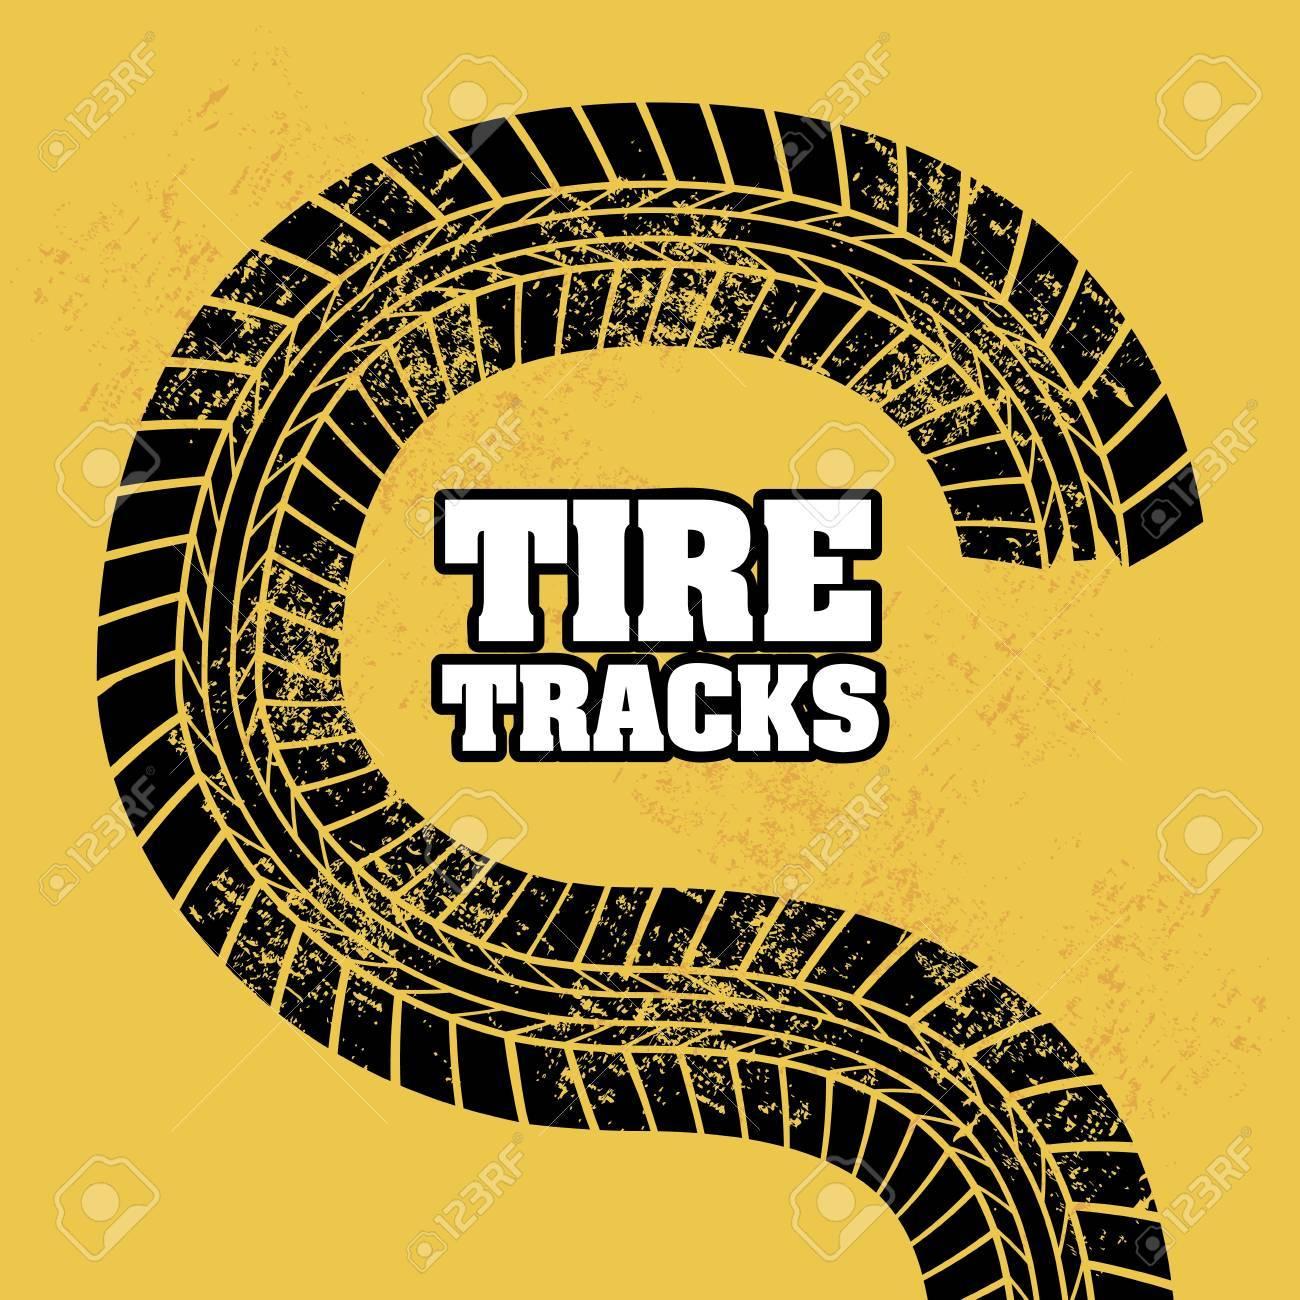 tire tracks over orange background Stock Vector - 20961245